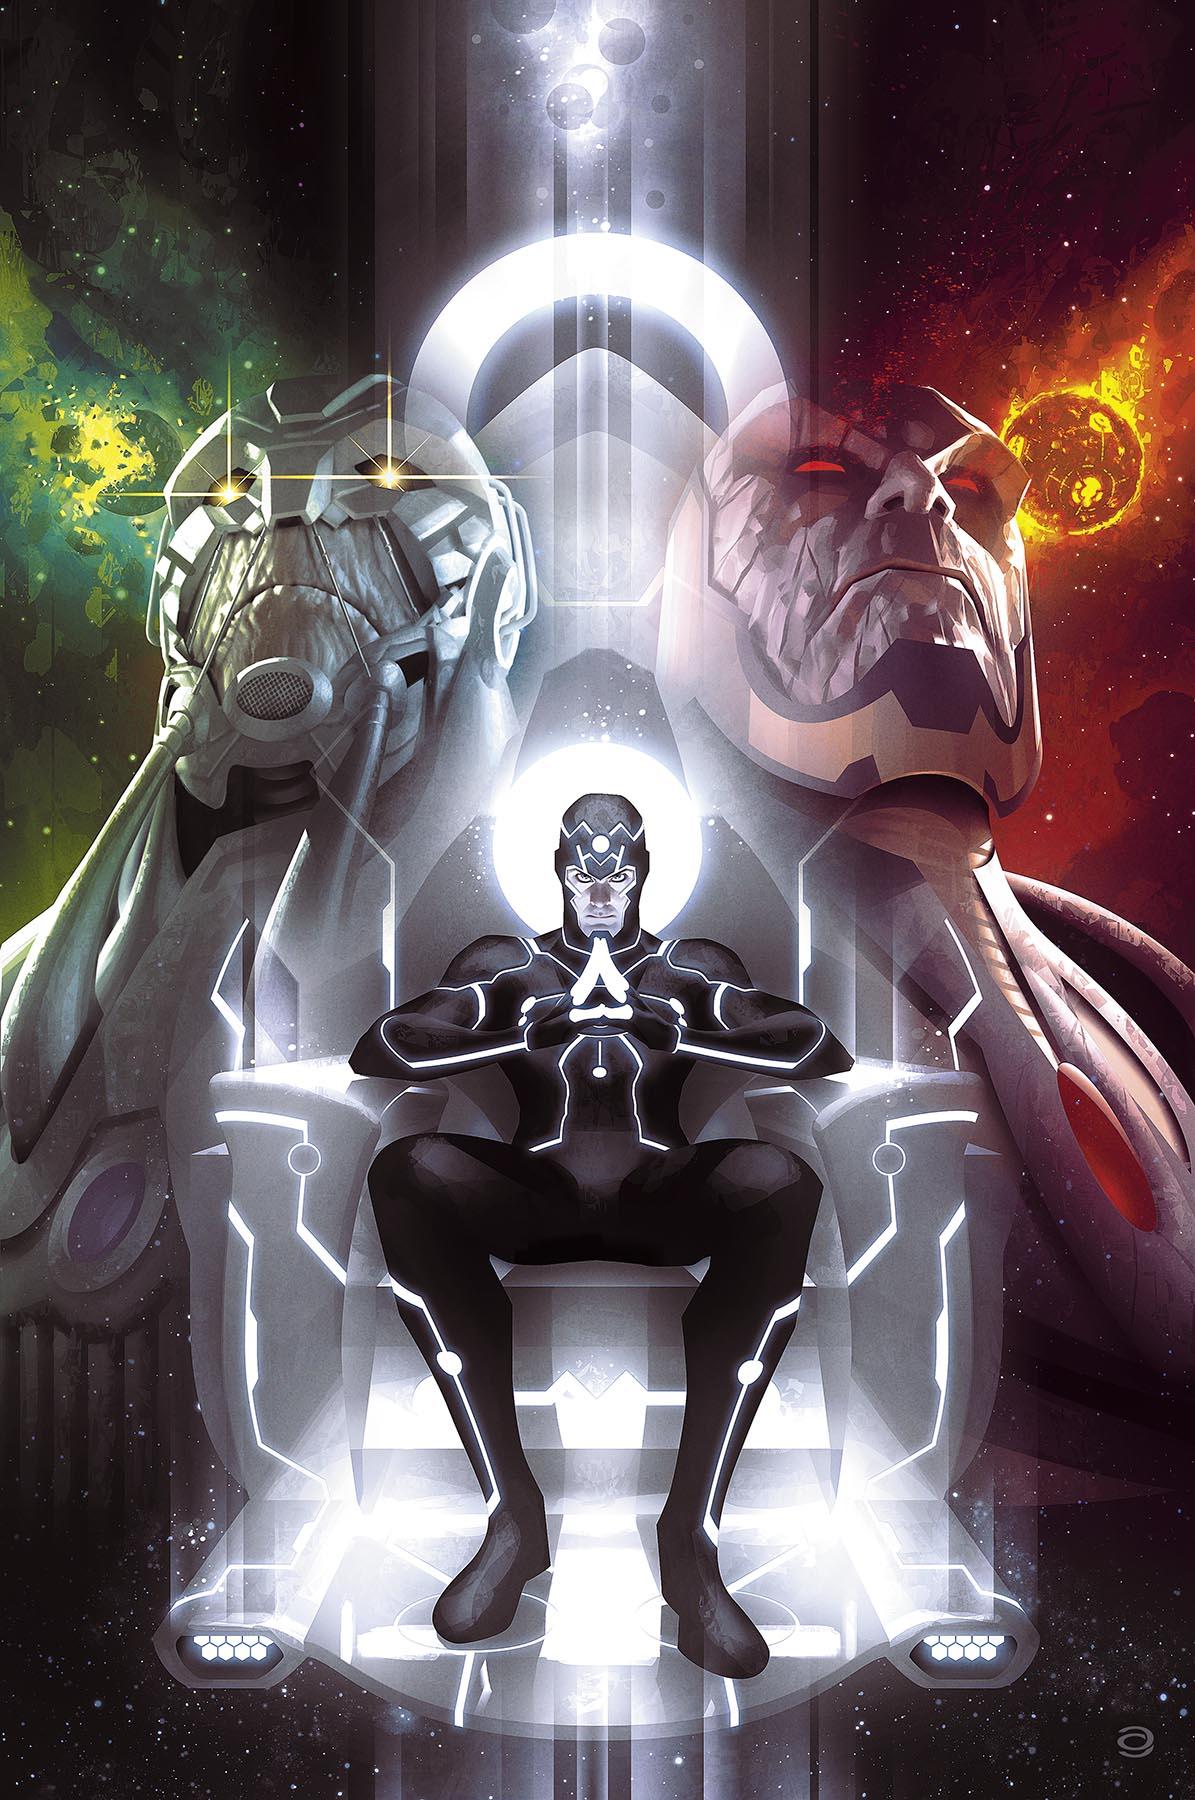 52 Photos 37 Reviews: Divergence Sera Le FCBD 2015 De DC Comics